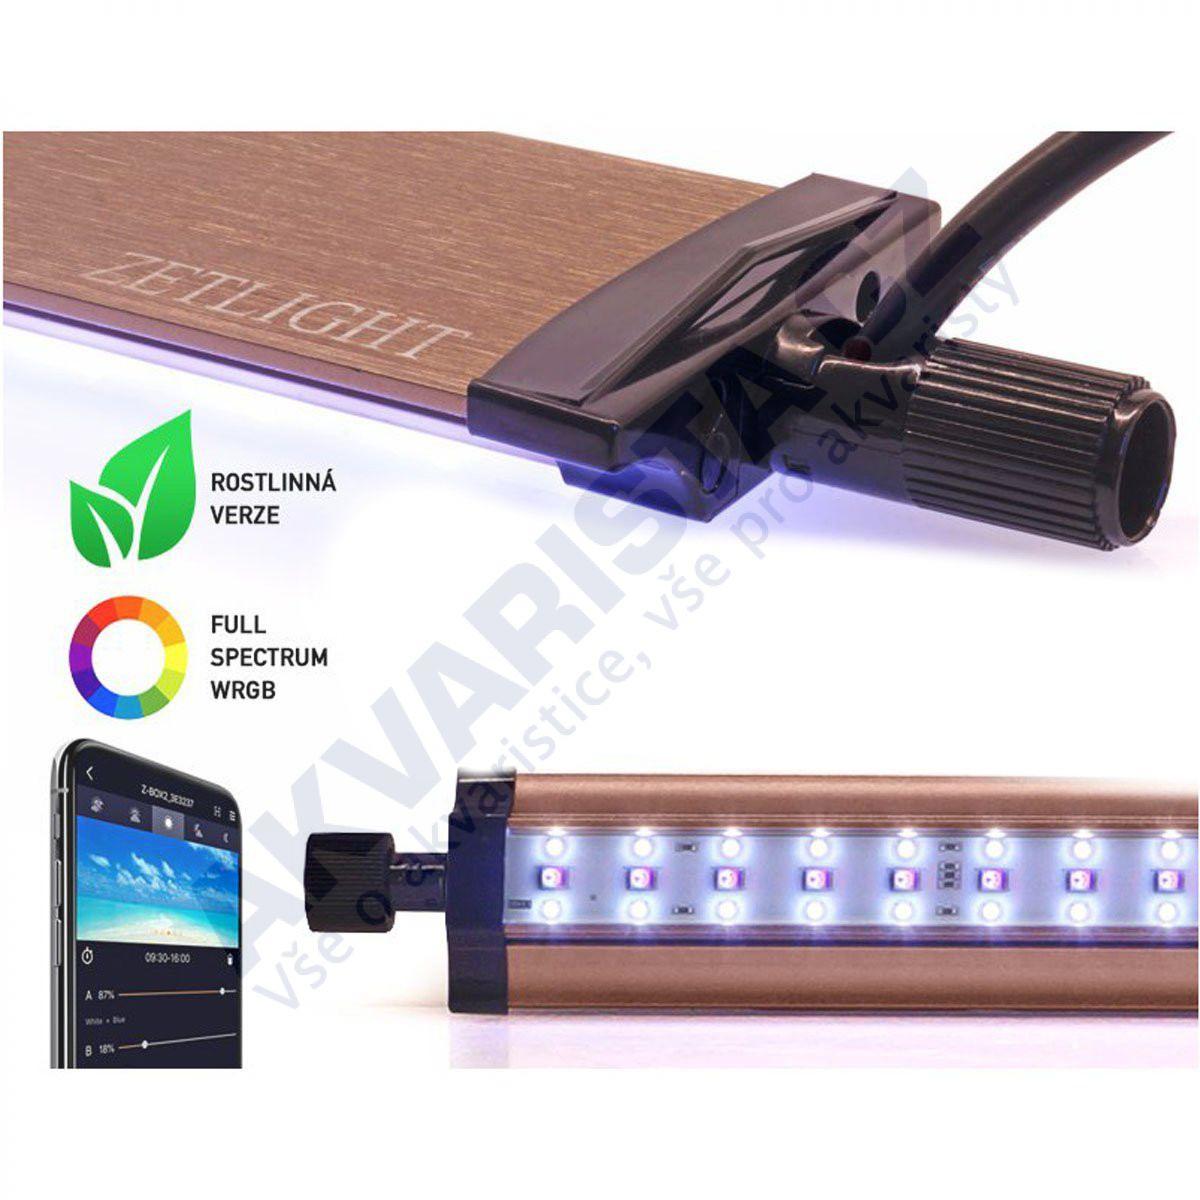 Zetlight LANCIA 2 PLANT WRGB/WIFI LED osvětlení 30cm 10W